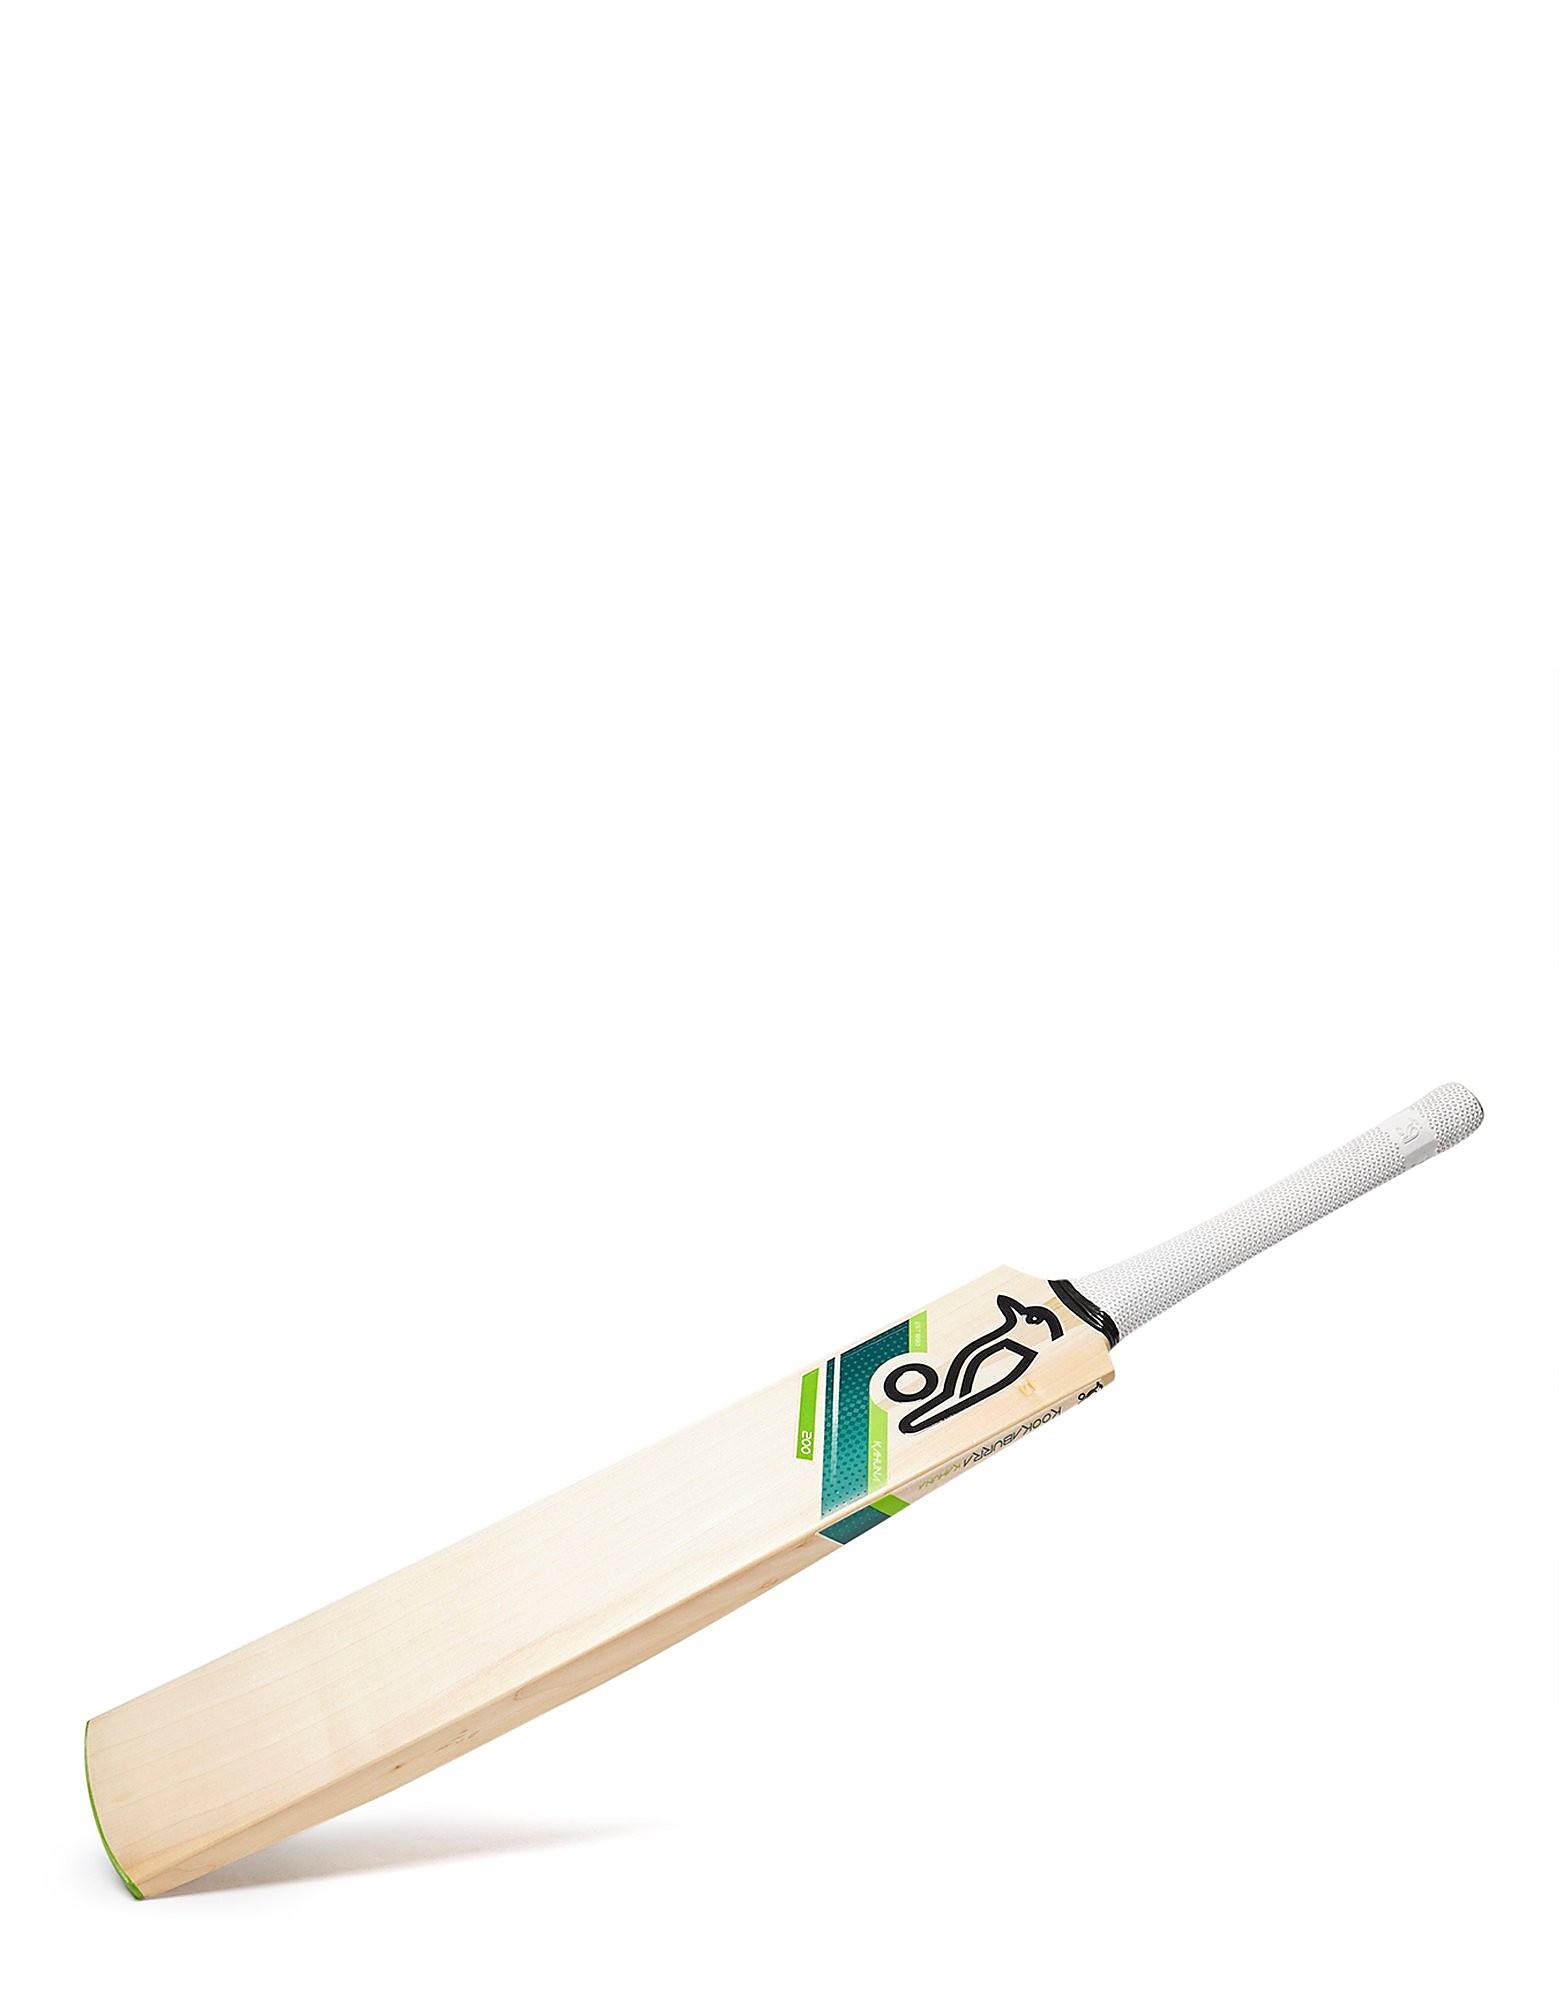 Kookaburra Kahuna 200 Cricket Bat Junior